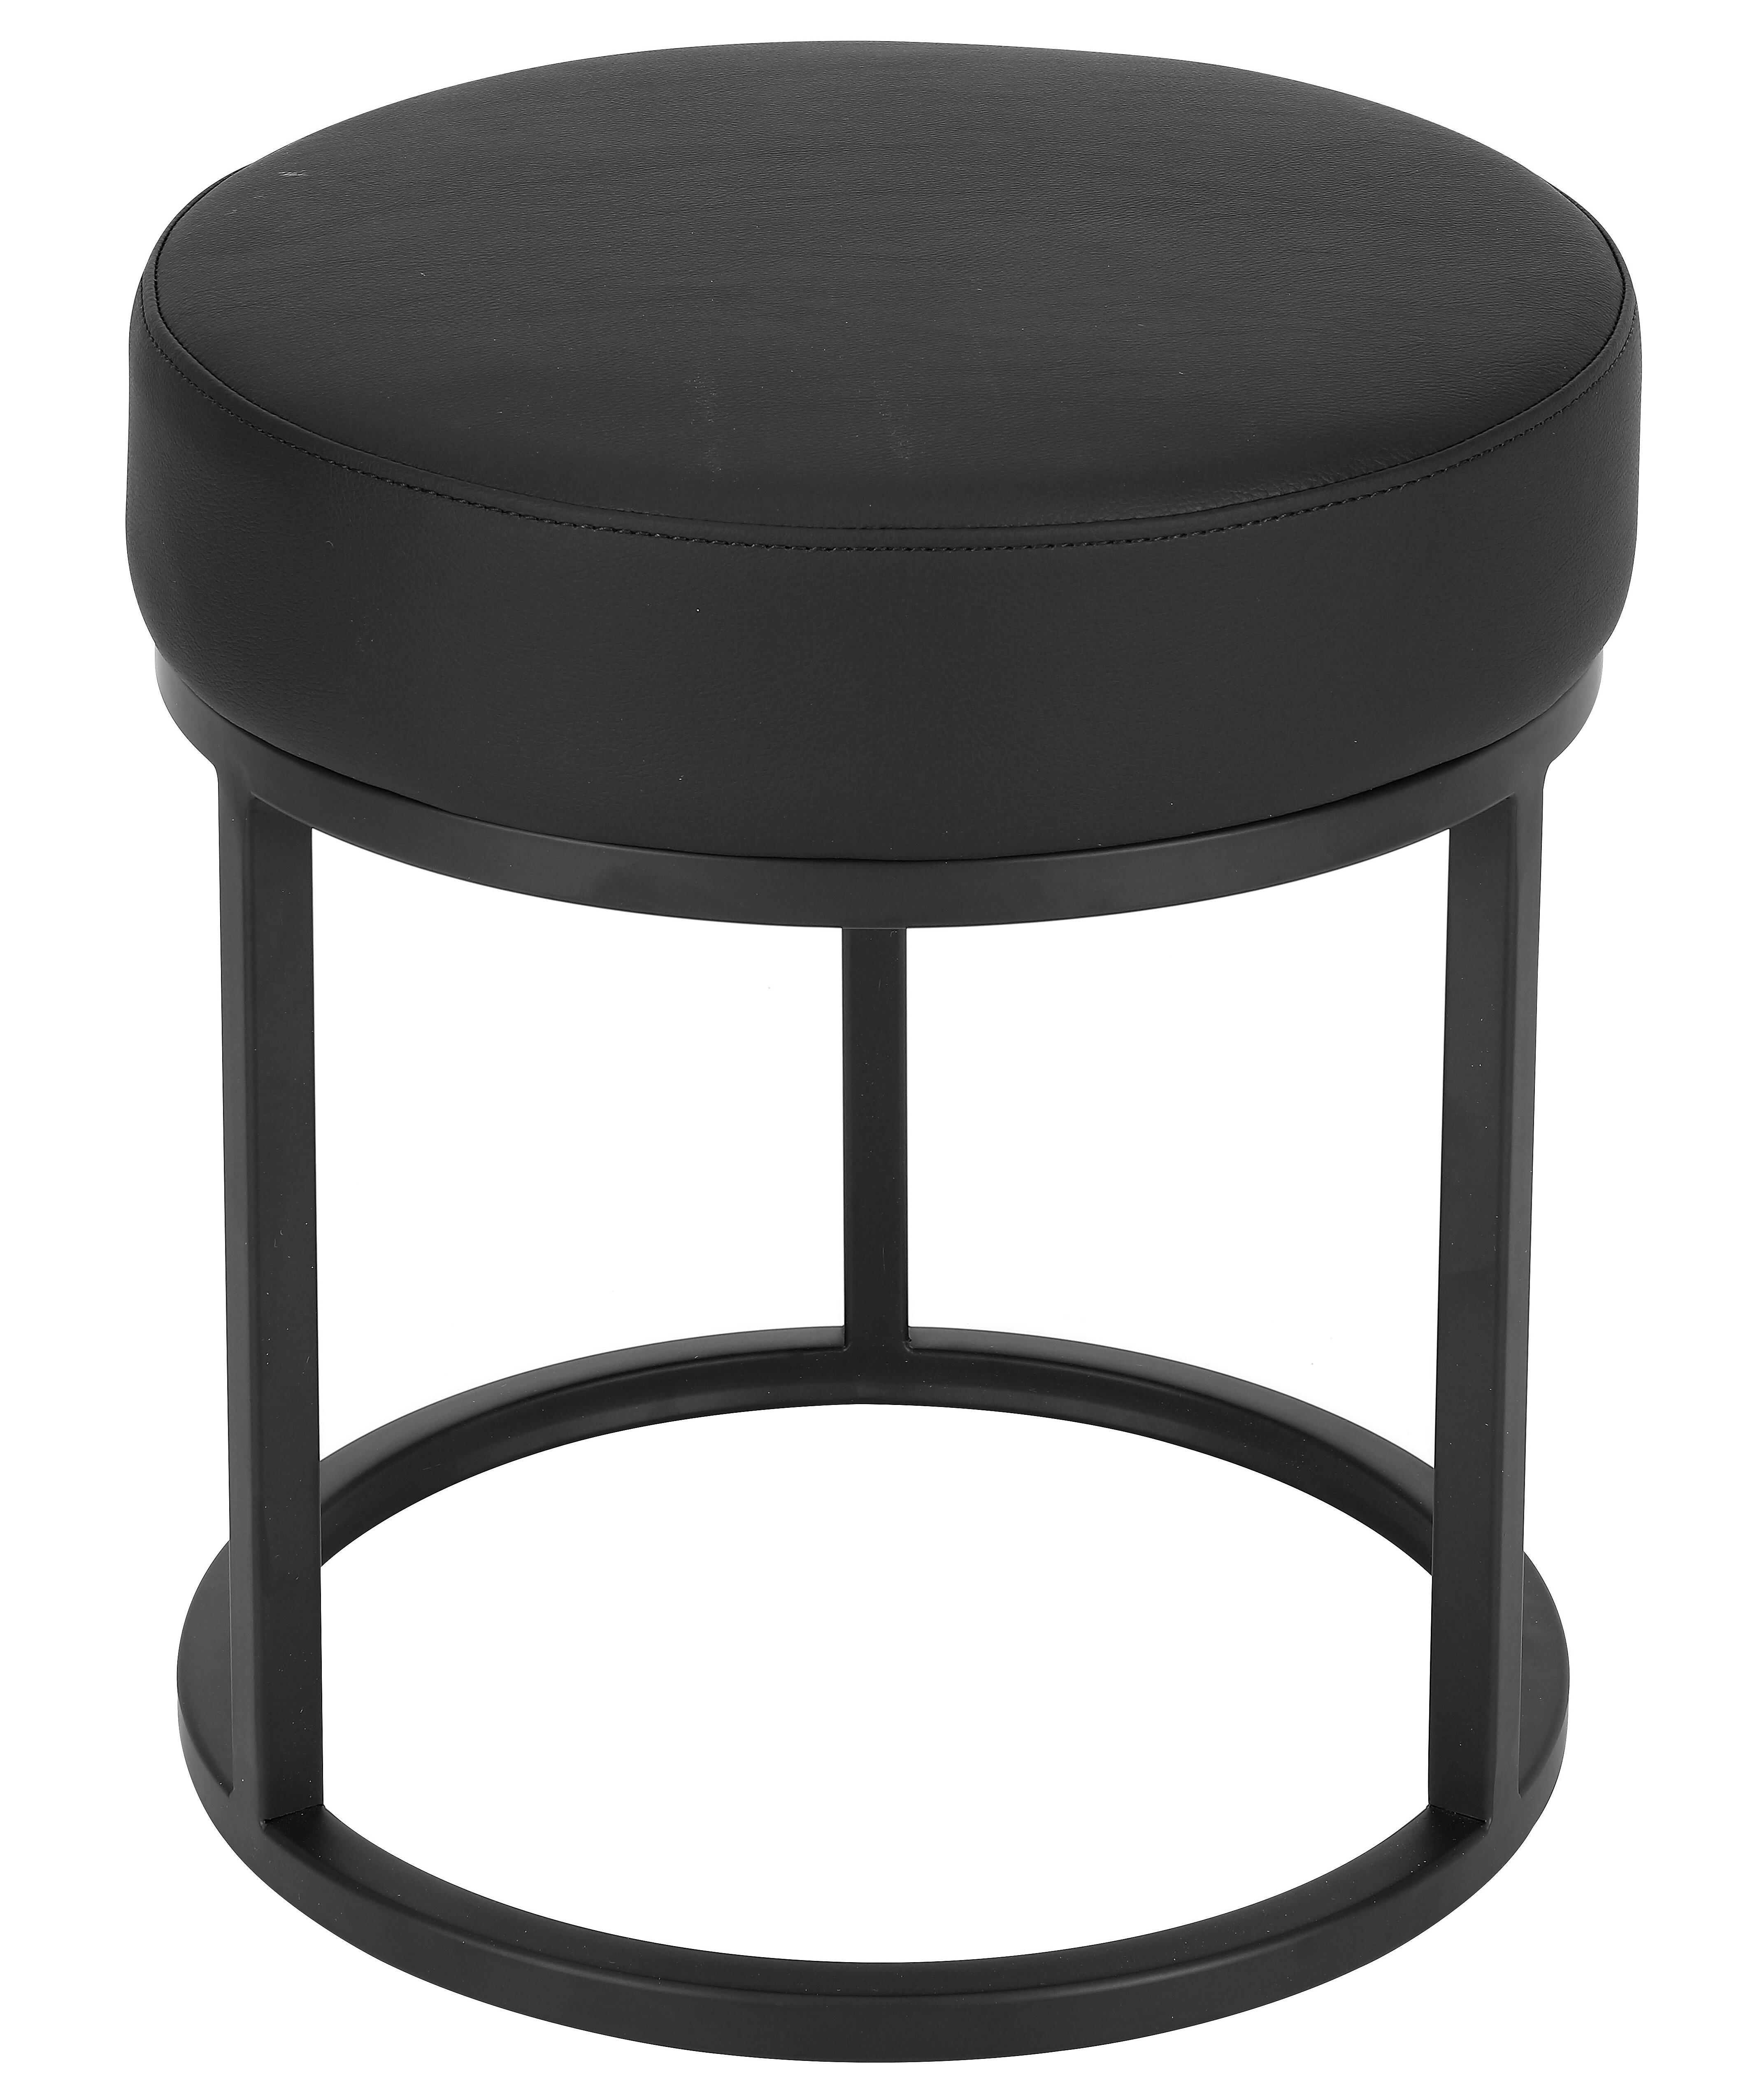 Sensational Mono Vanity Stool Creativecarmelina Interior Chair Design Creativecarmelinacom